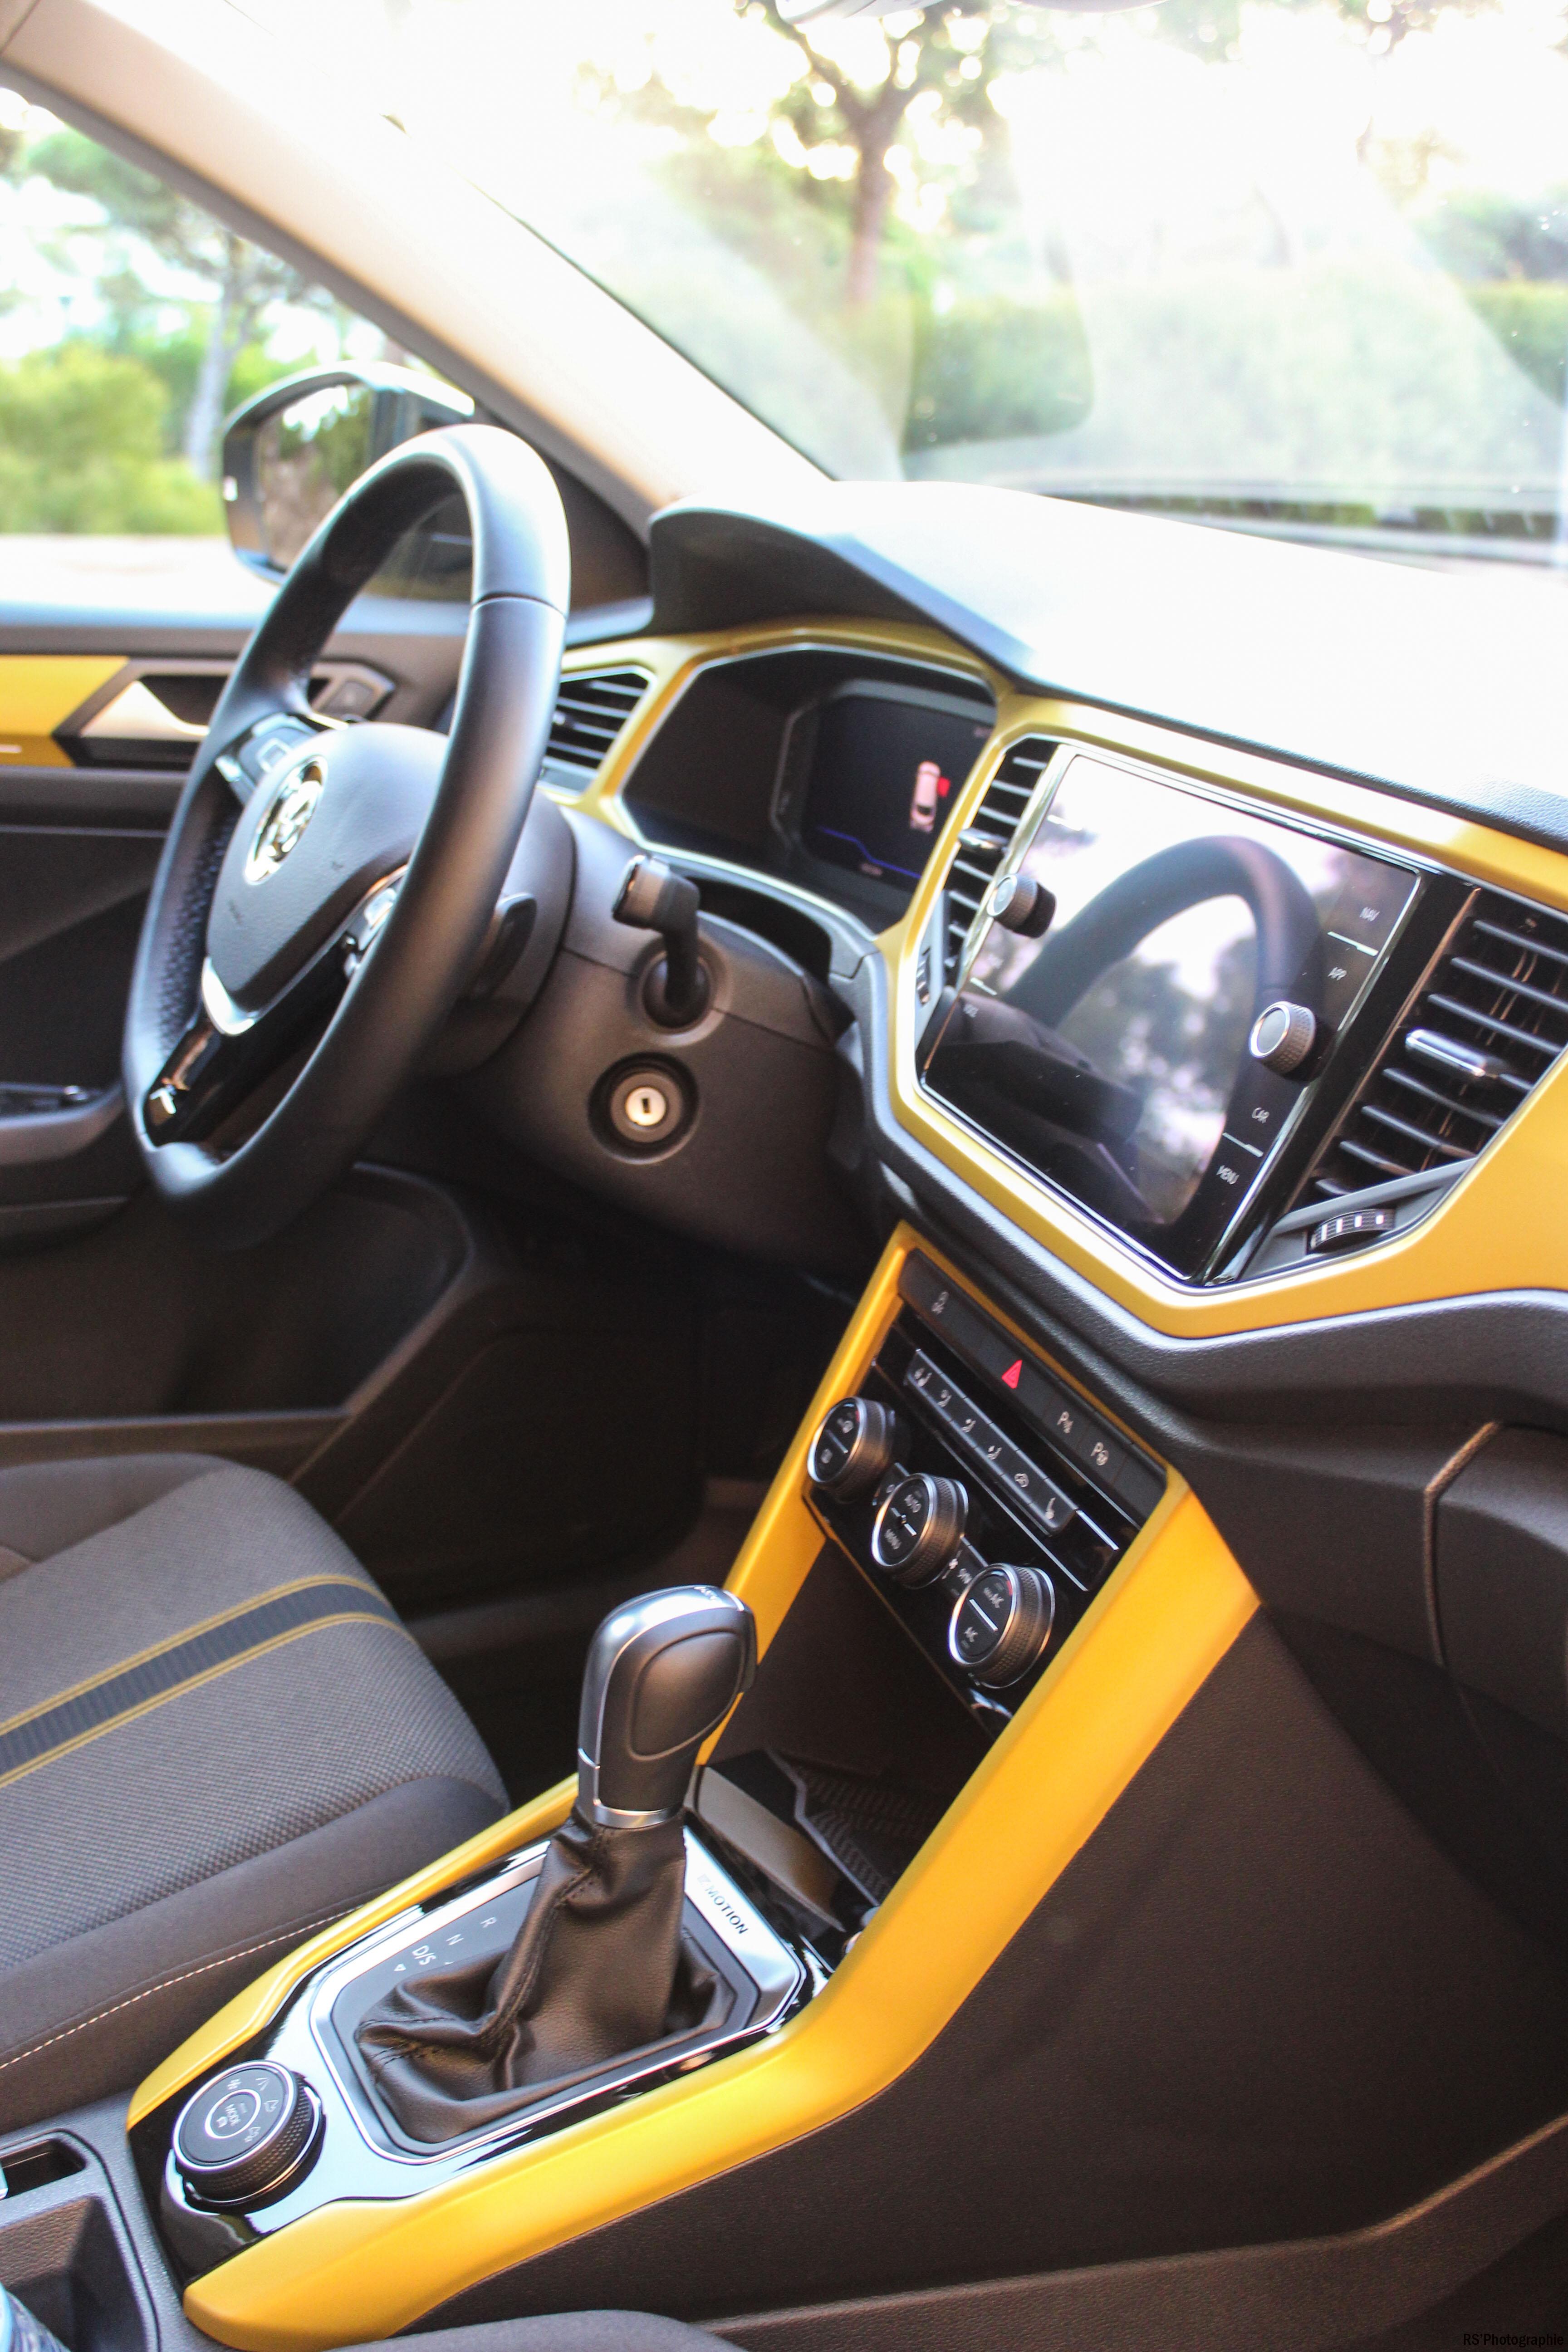 Volkswagentroc74-vw-t-roc-intérieur-onboard-Arnaud Demasier-RSPhotographie